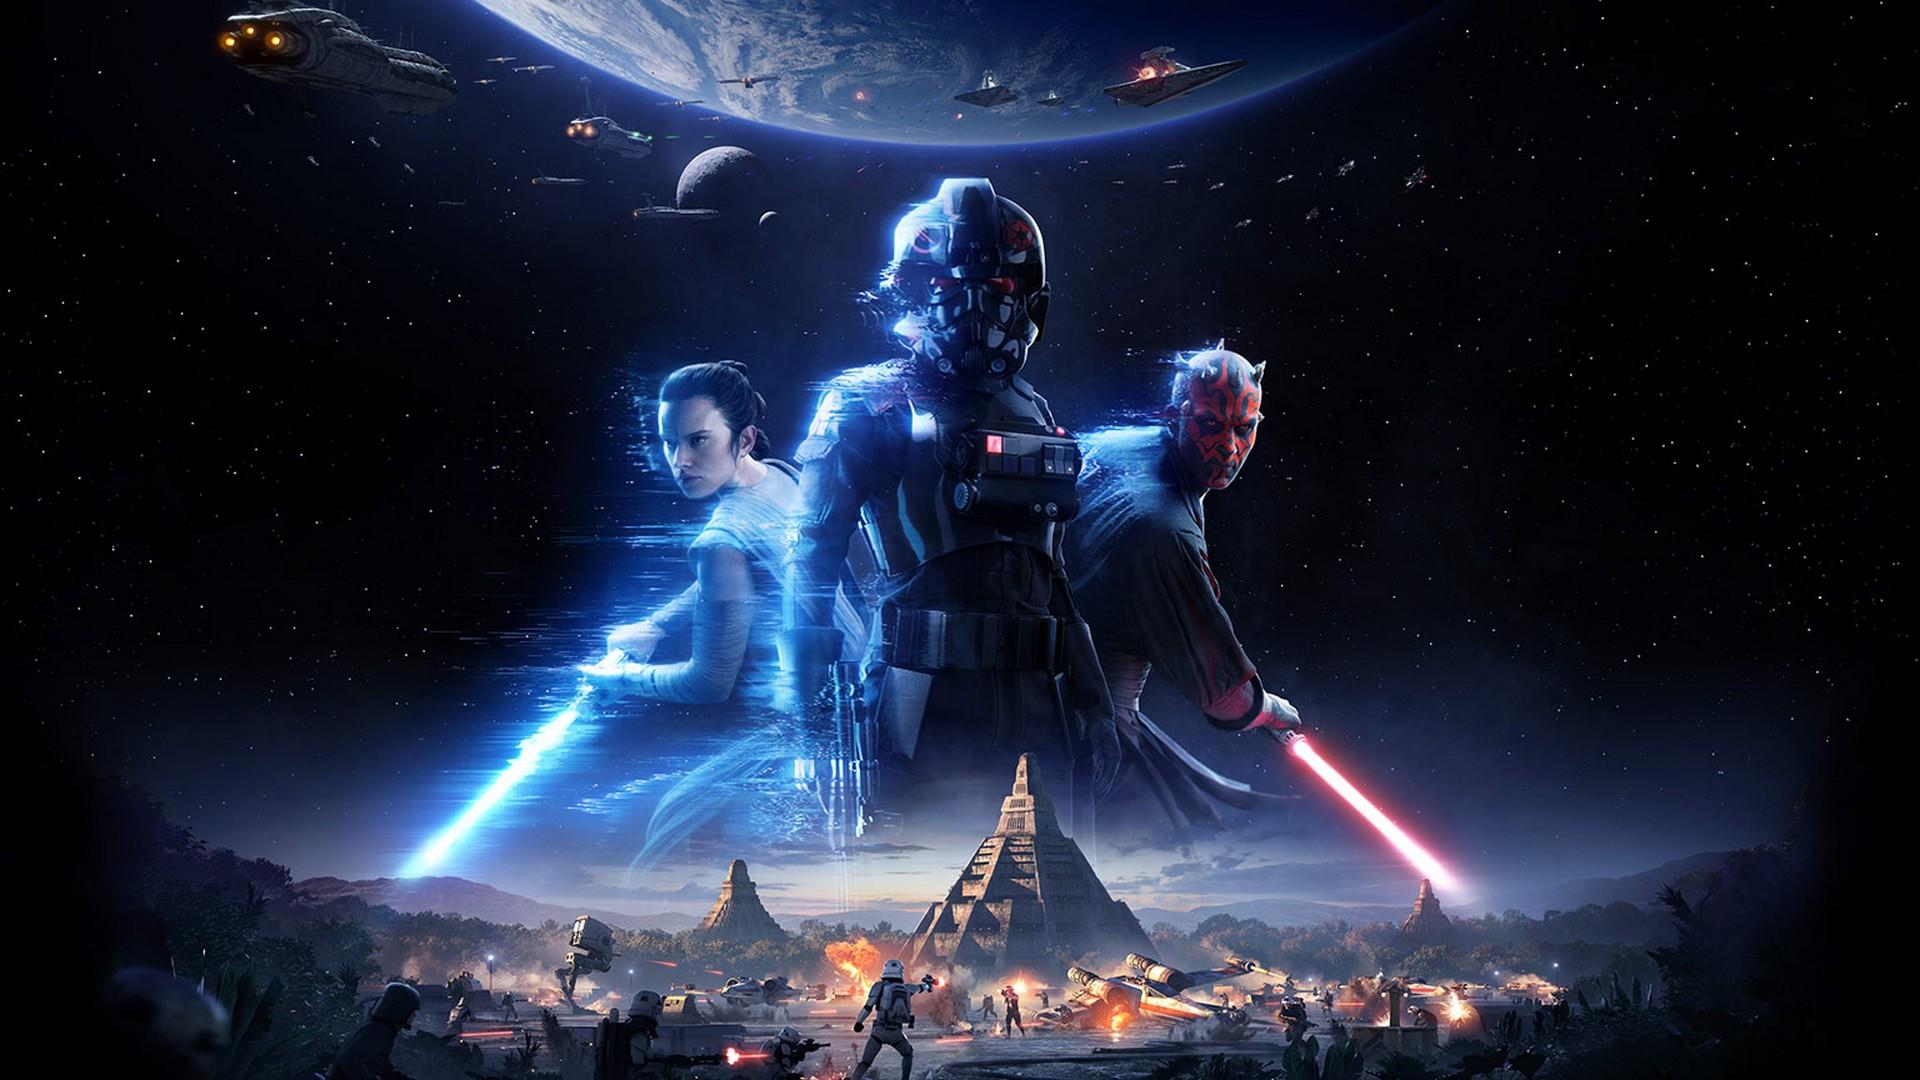 Star Wars: EA grossed $ 3 billion from licensing